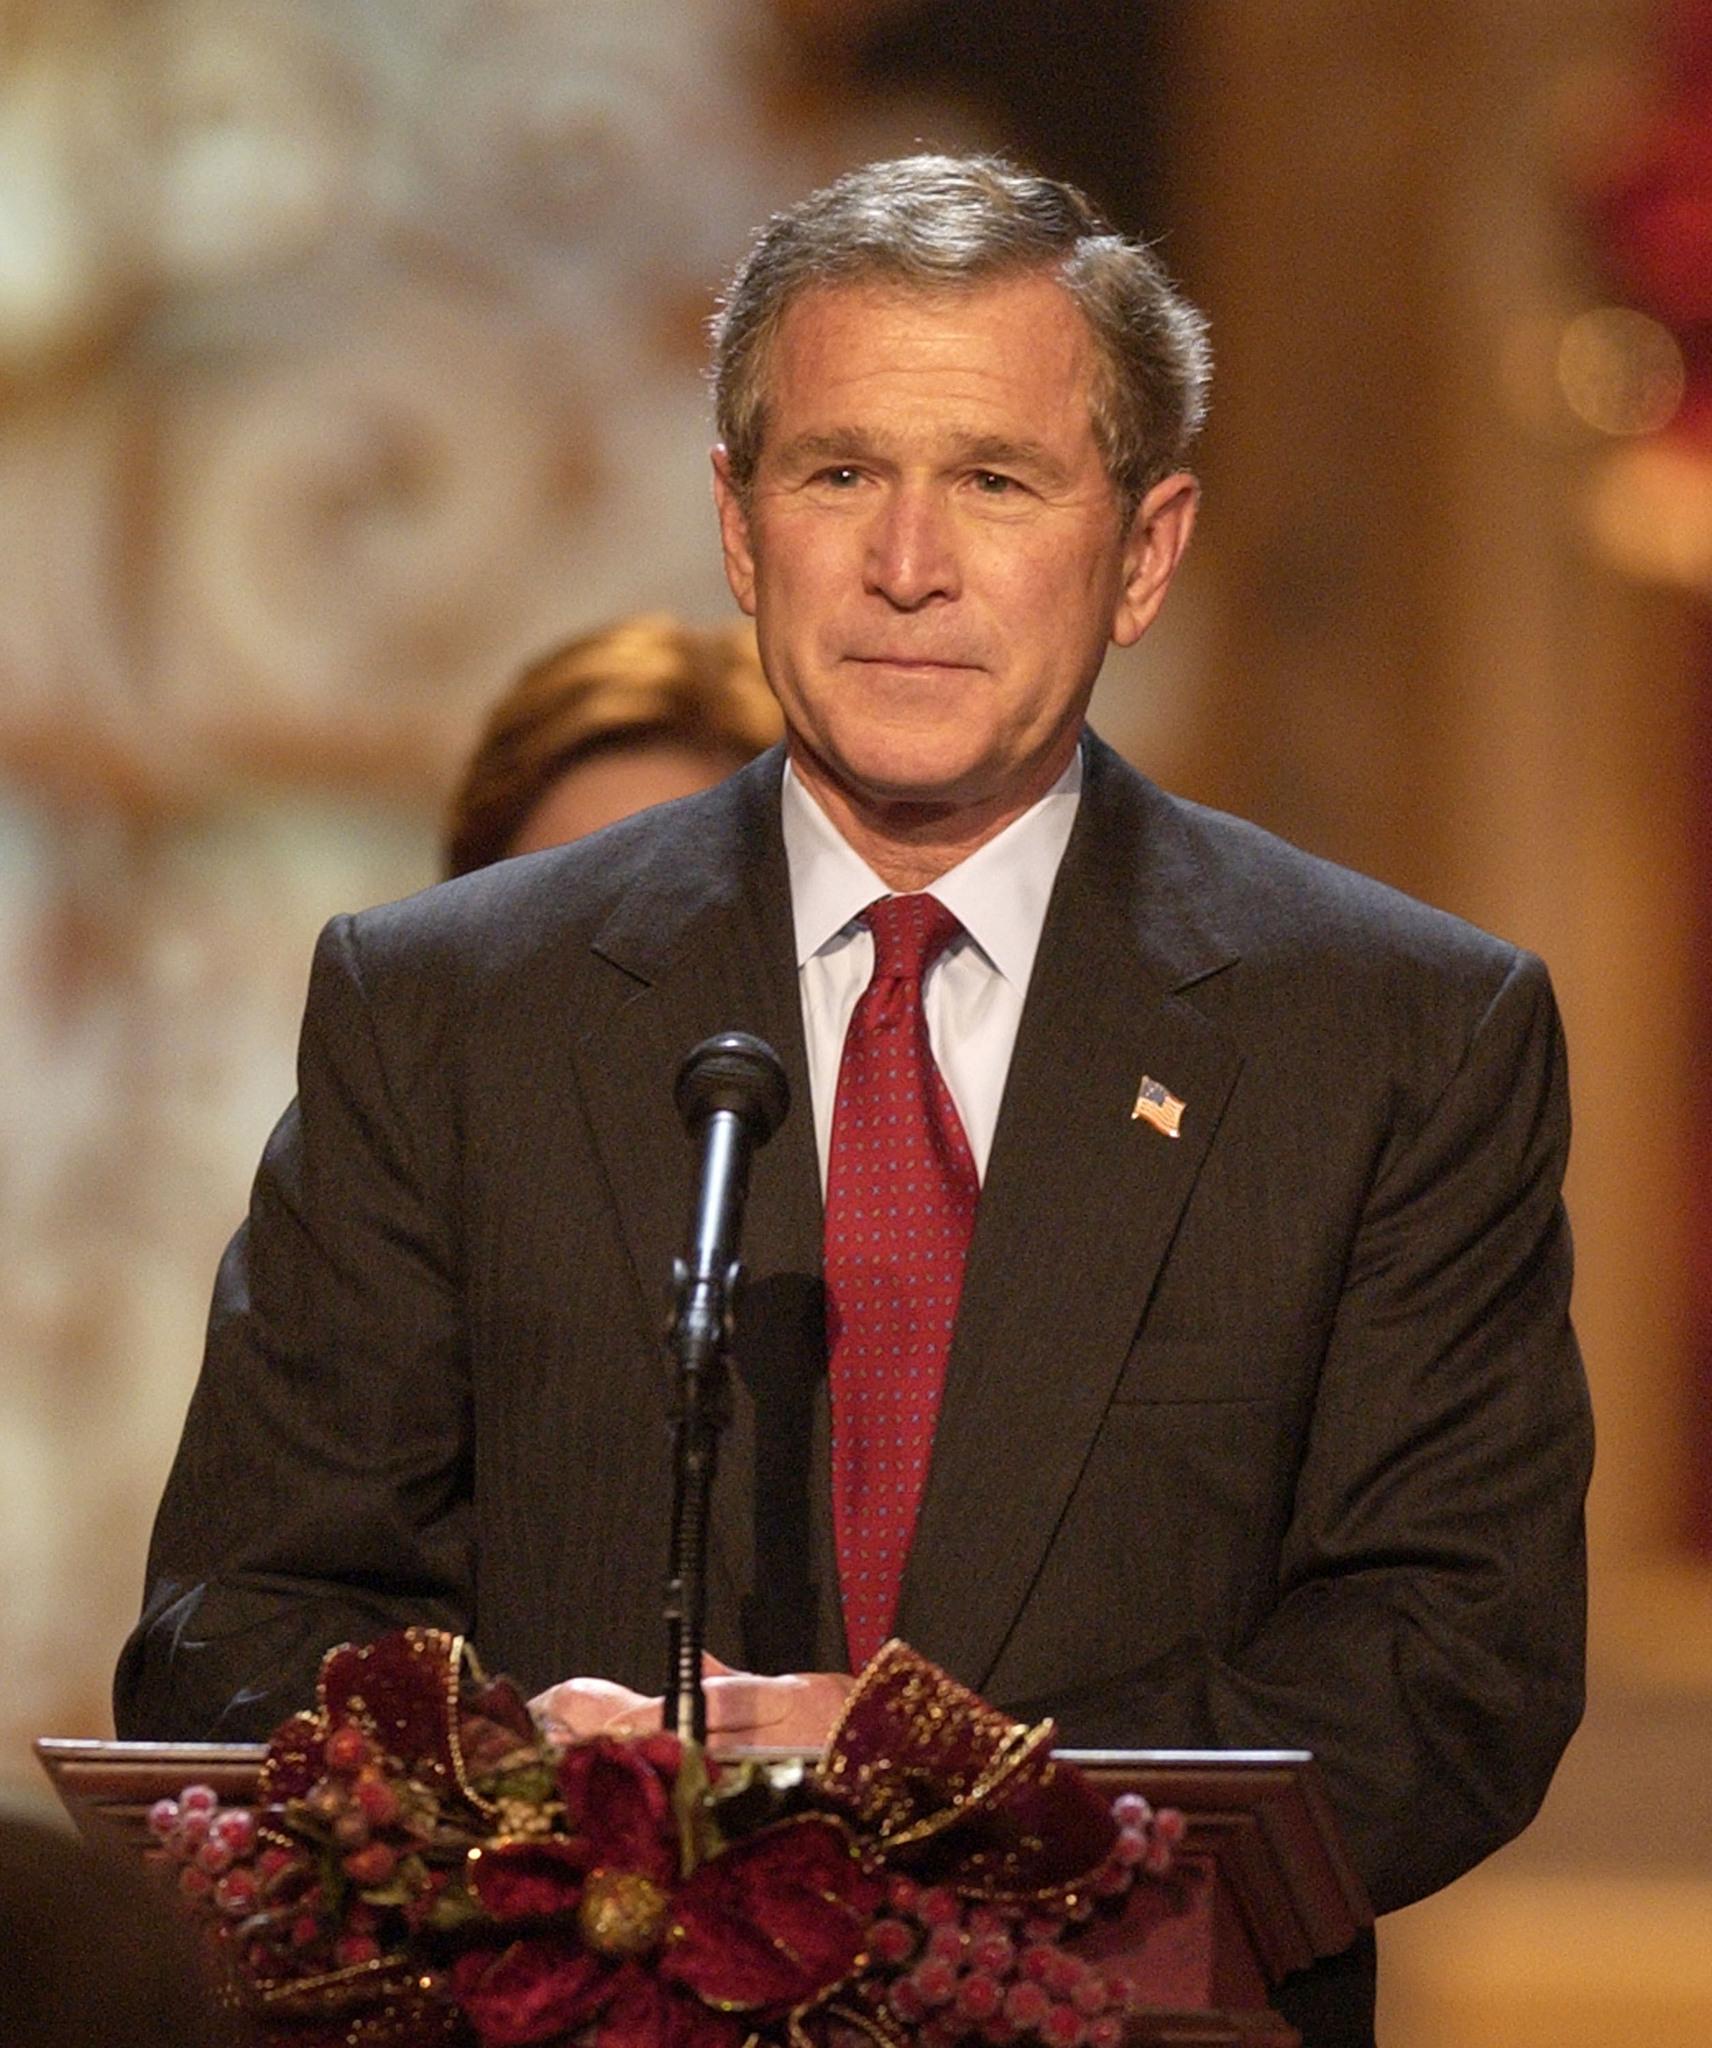 George W Bush Imdb